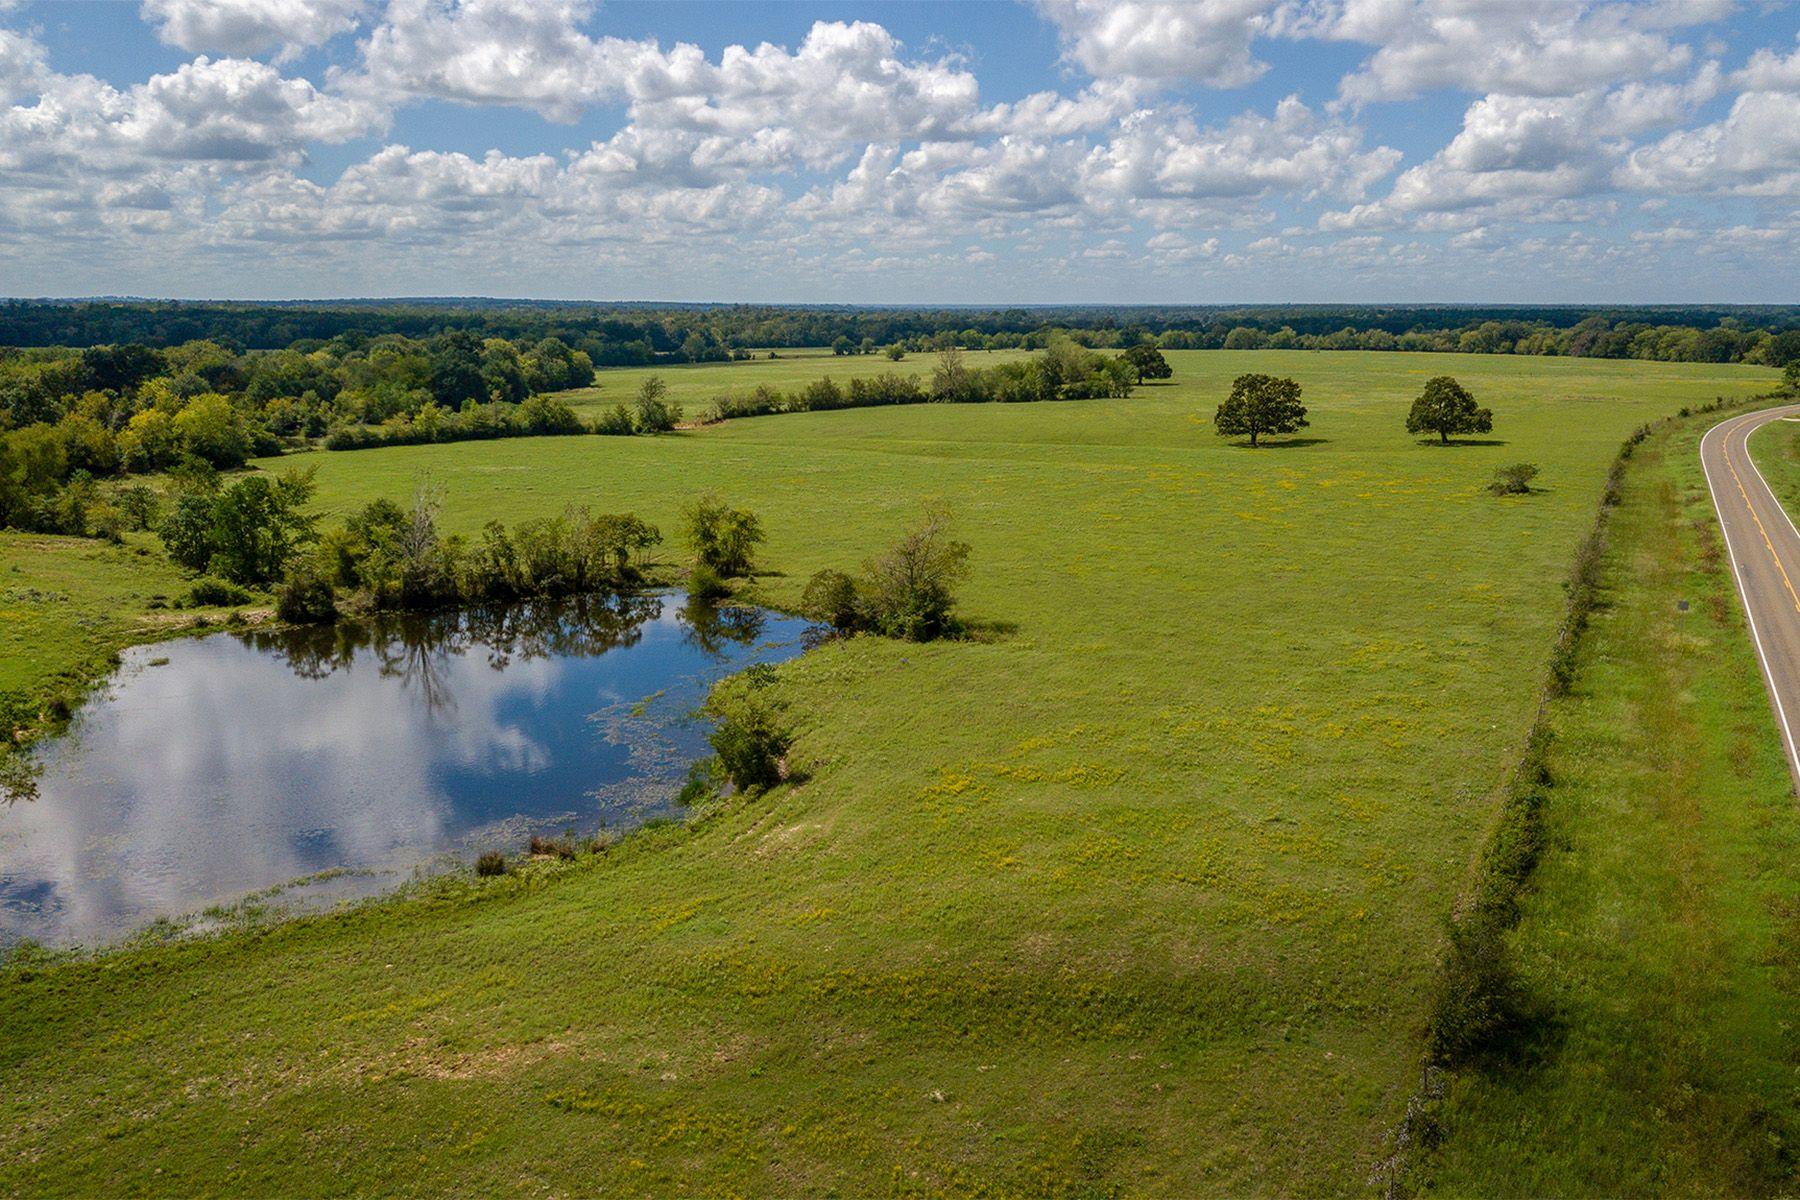 Land for Sale at Fm 1280 Lovelady, Texas 75851 United States